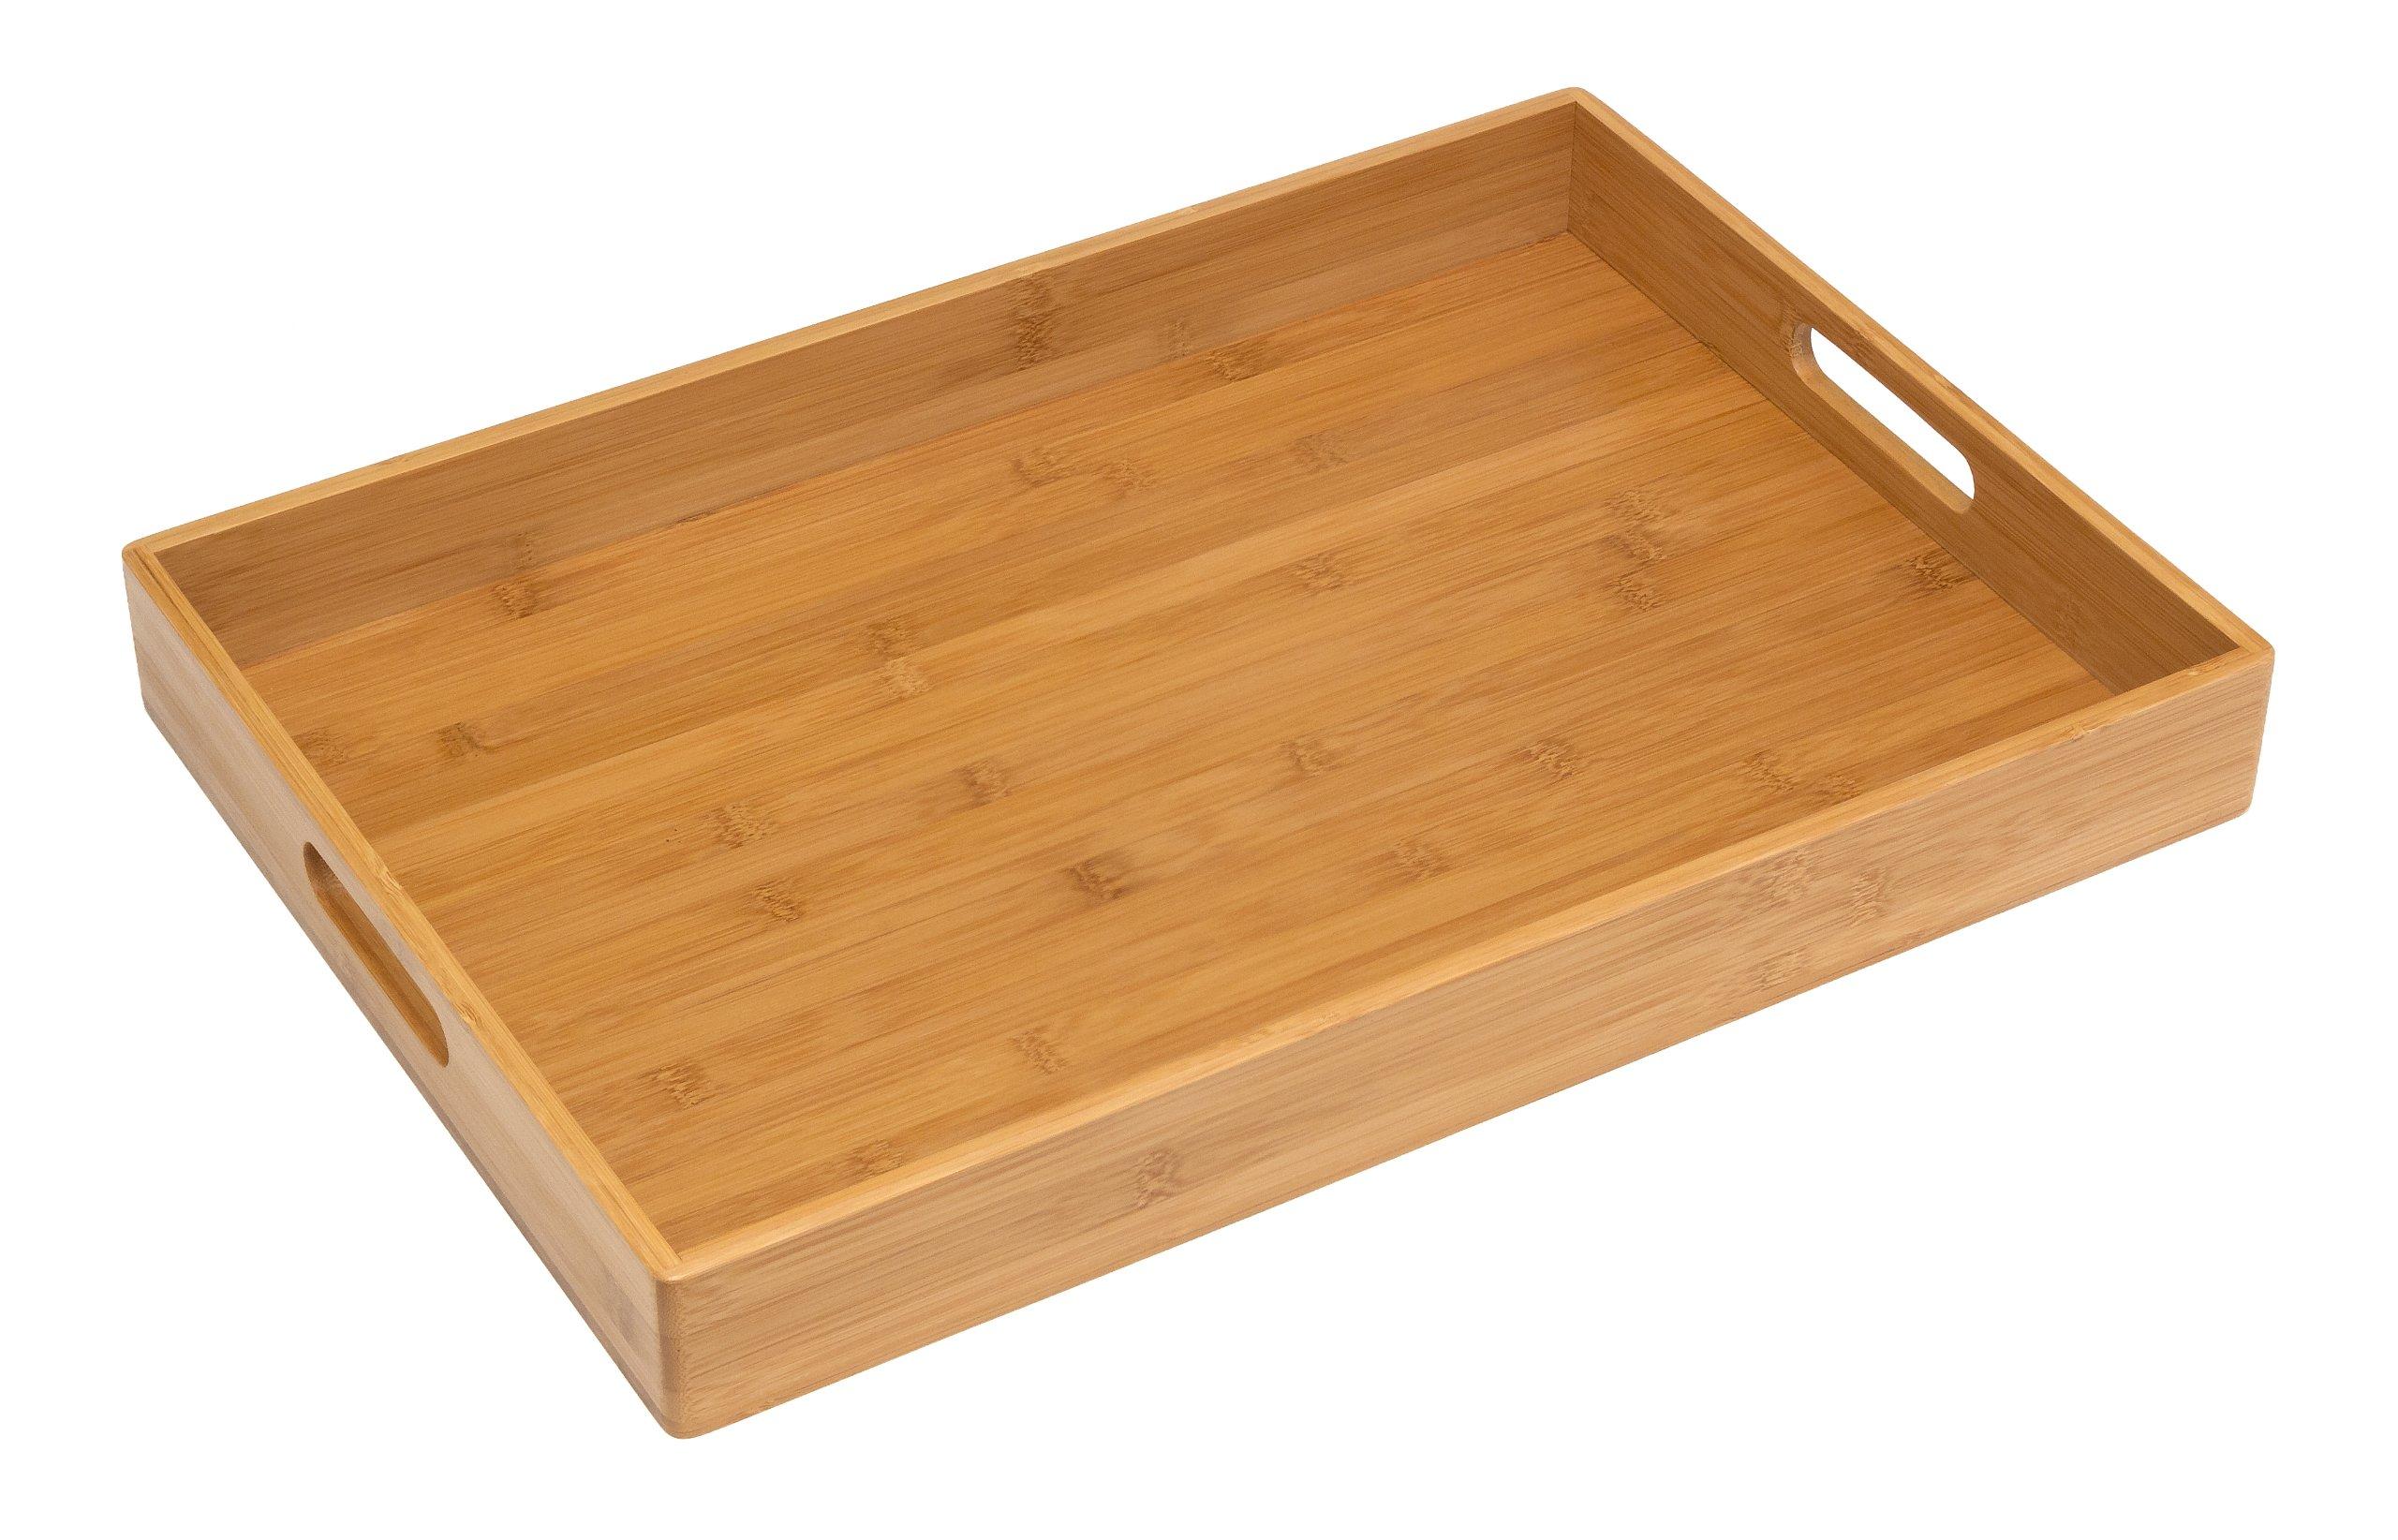 Lipper International 8865 Solid Bamboo Wood Serving Tray, 19.75'' x 13.75'' x 2.25''